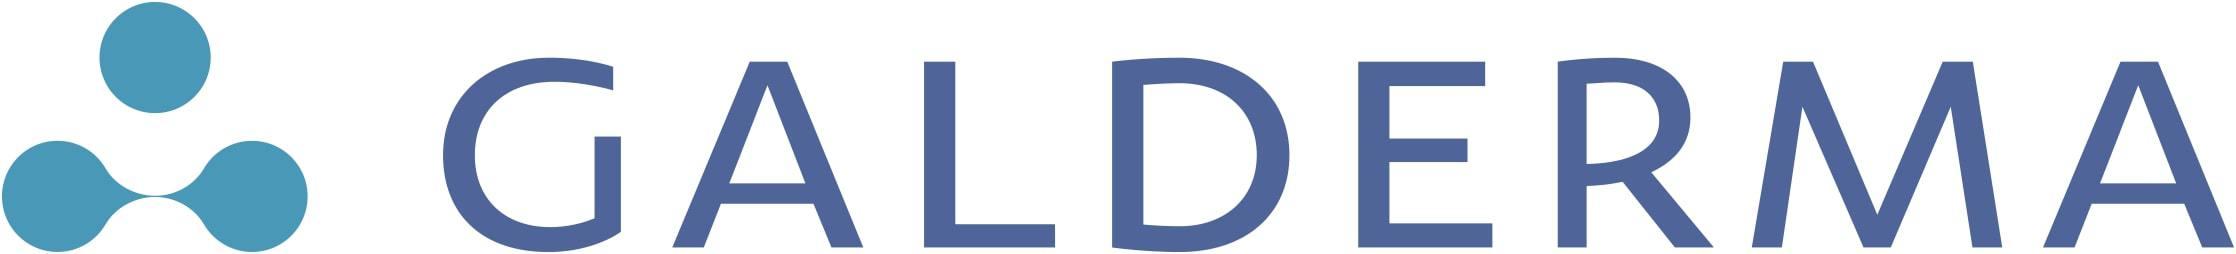 NEW GALDERMA LOGO RGB 300 DPI